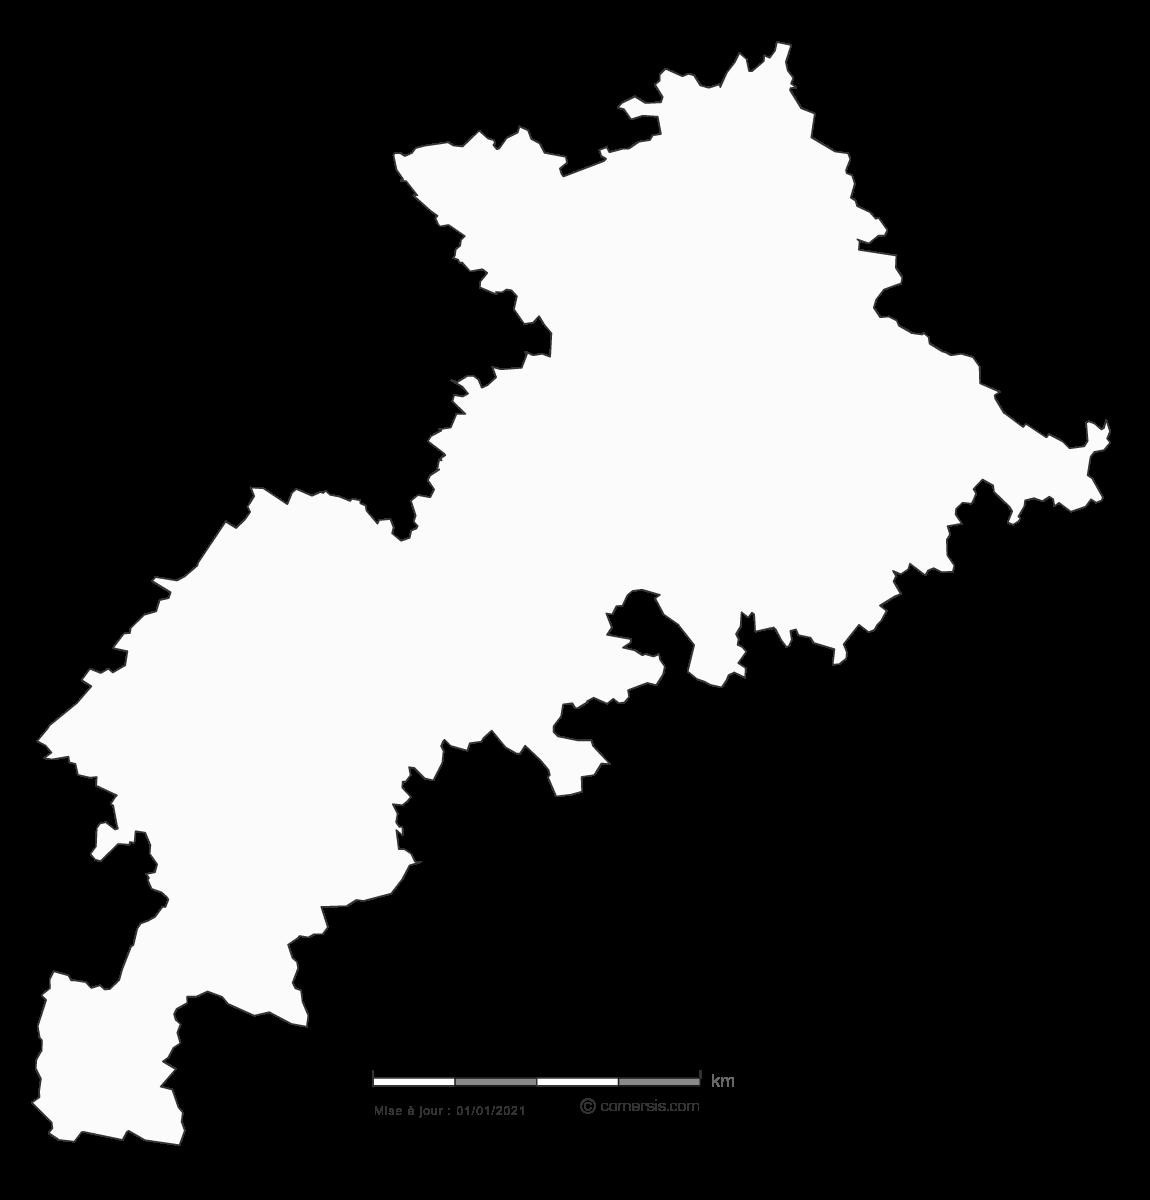 carte gratuite de la Haute-Garonne 31